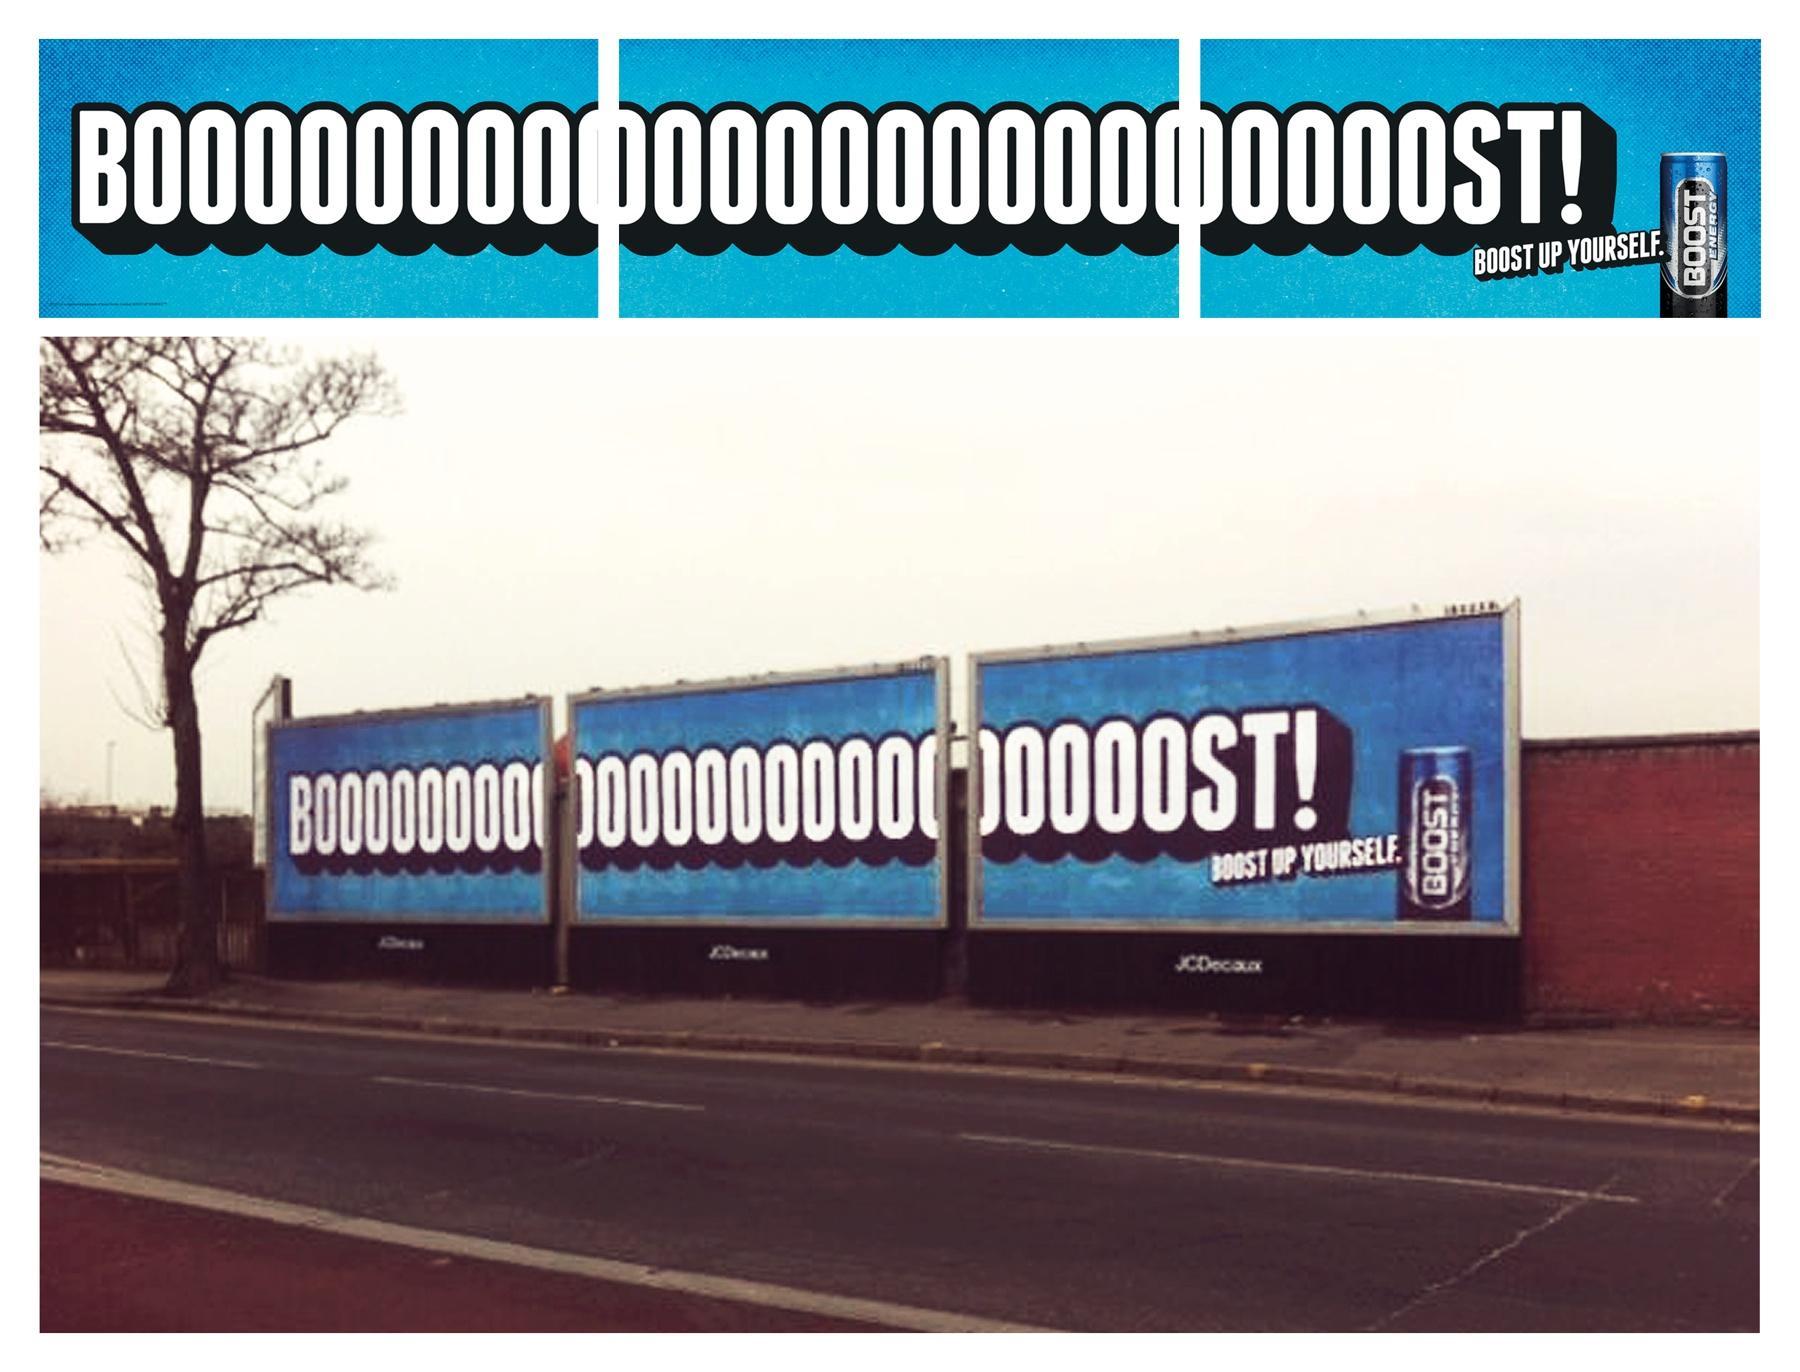 Boost Outdoor Ad -  Boooooooooooooooooooooost